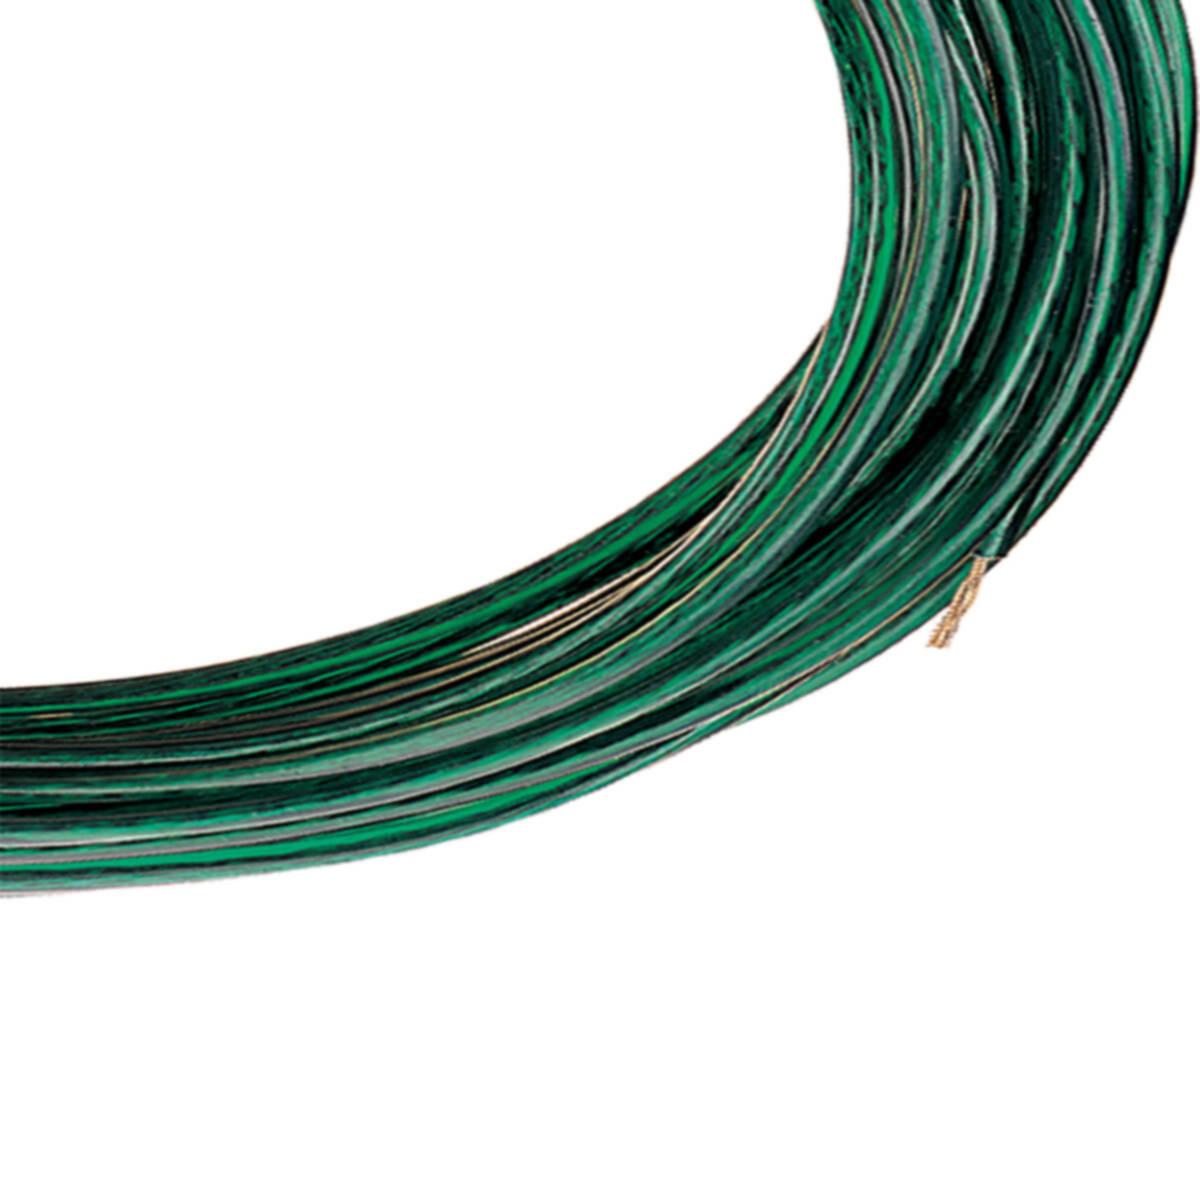 Ben-Mor Cables 90284